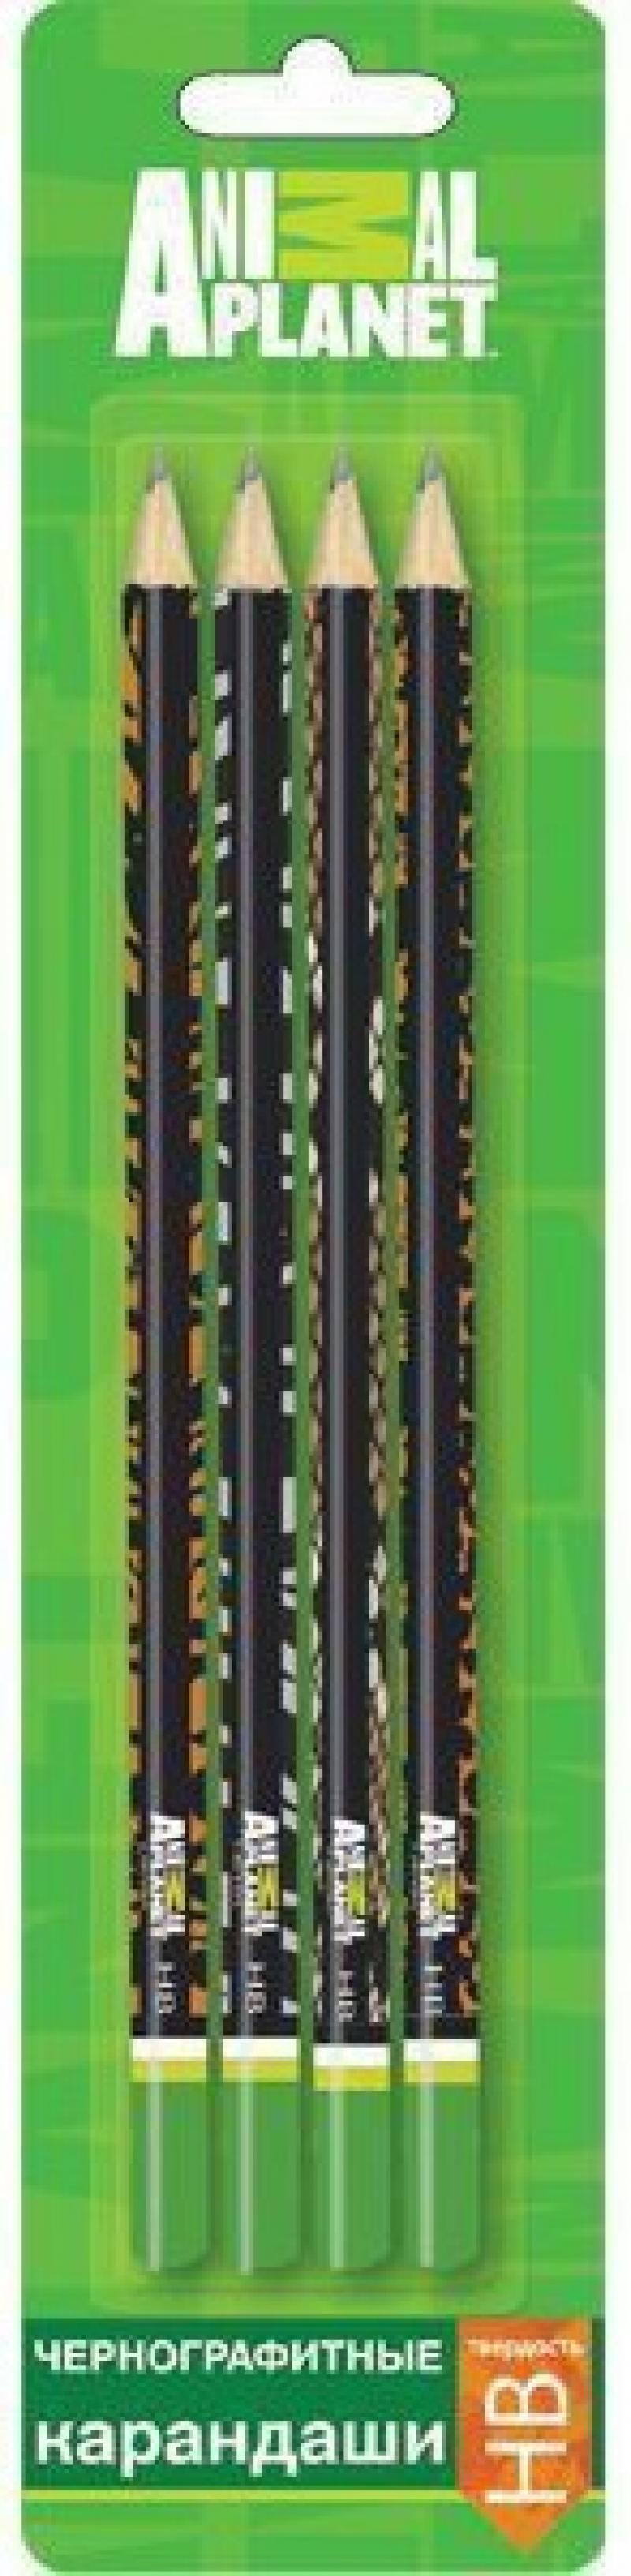 Карандаши чернографитные Action! Animal Planet 4 шт 180 мм AP-ABP115/4 AP-ABP115/4 compatible new a4431 print head for avery dennison ap5 4 ap 5 4 barcode printer 305dpi